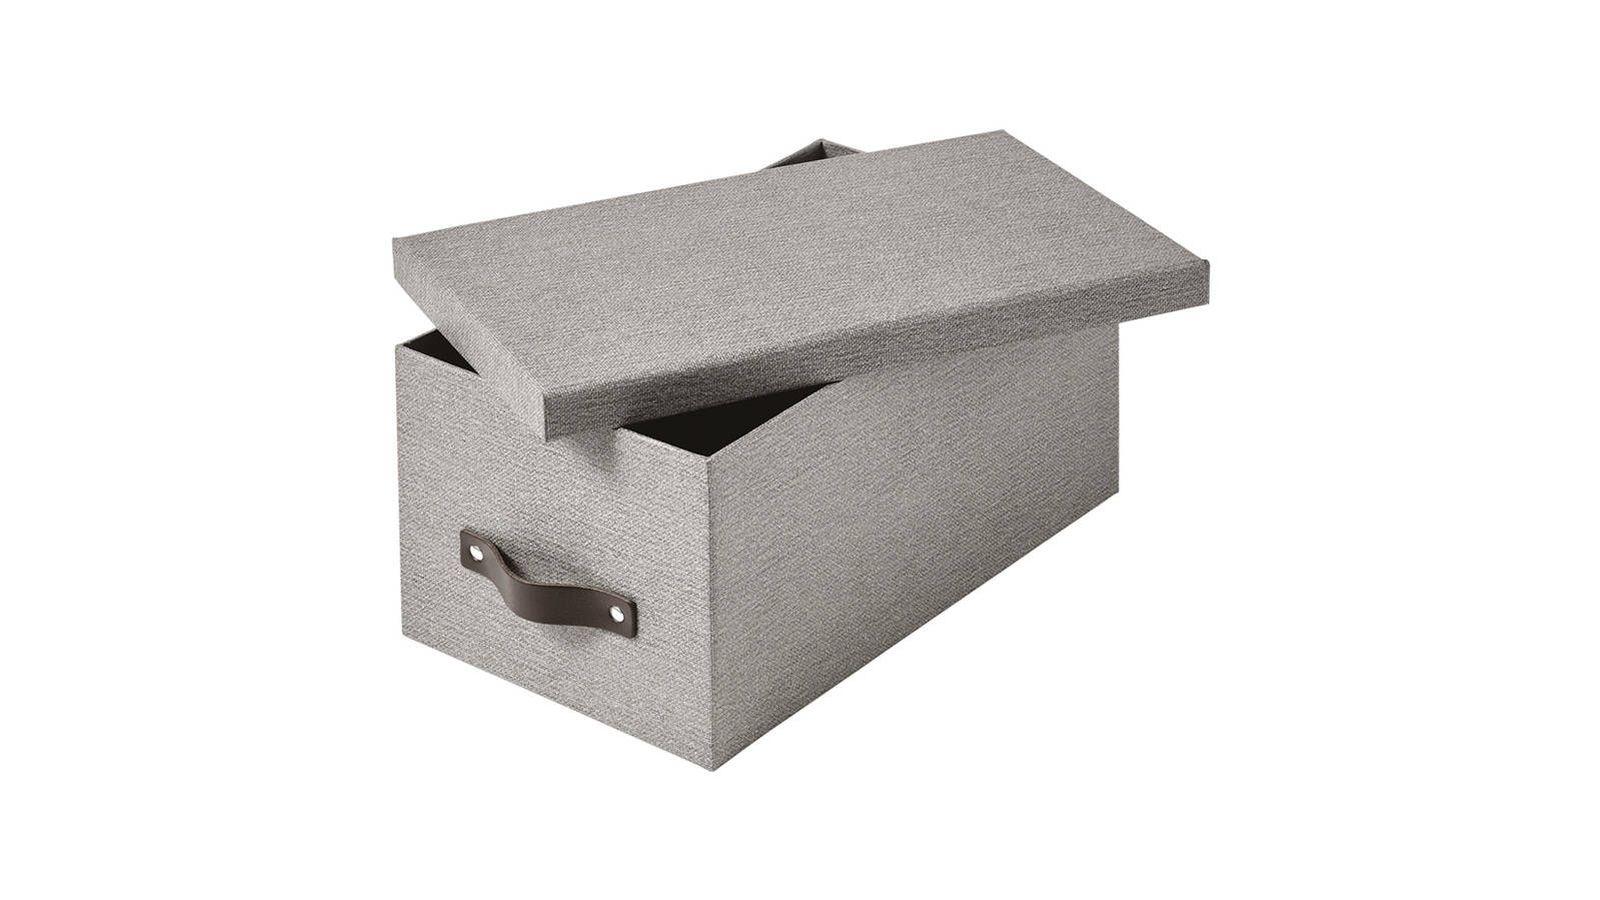 Mueble taquilla ikea obtenga ideas dise o de muebles para su hogar aqu - Mueble cd ikea ...